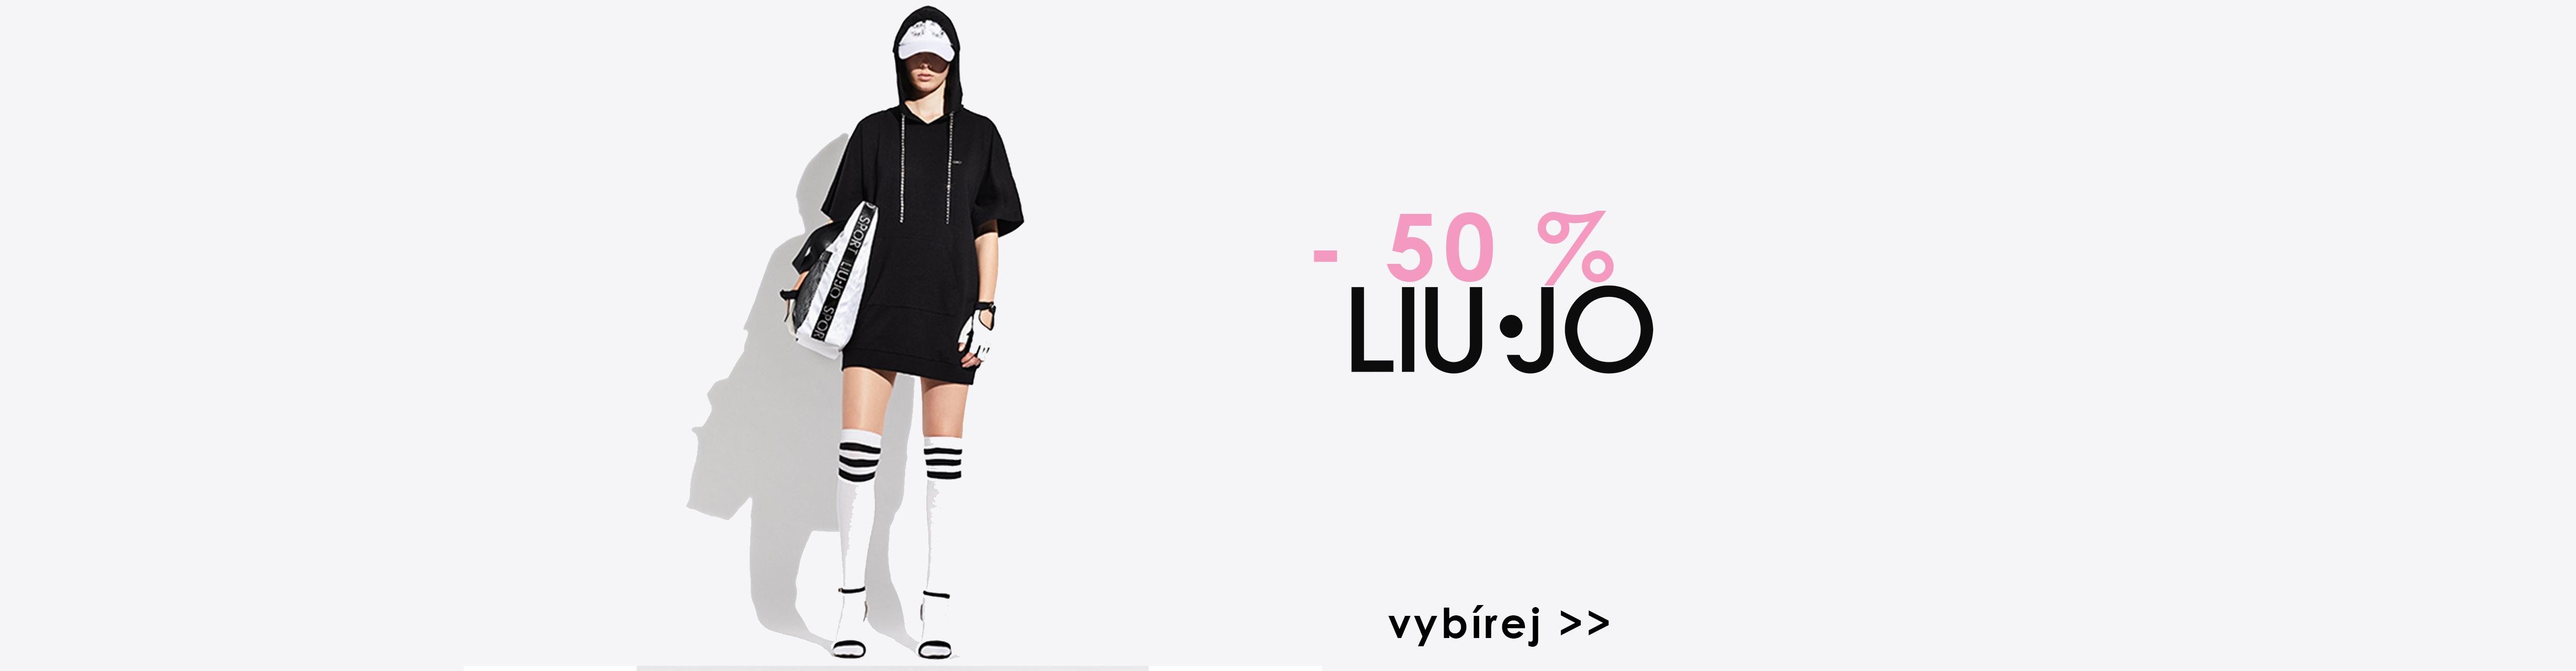 Liujo -20%